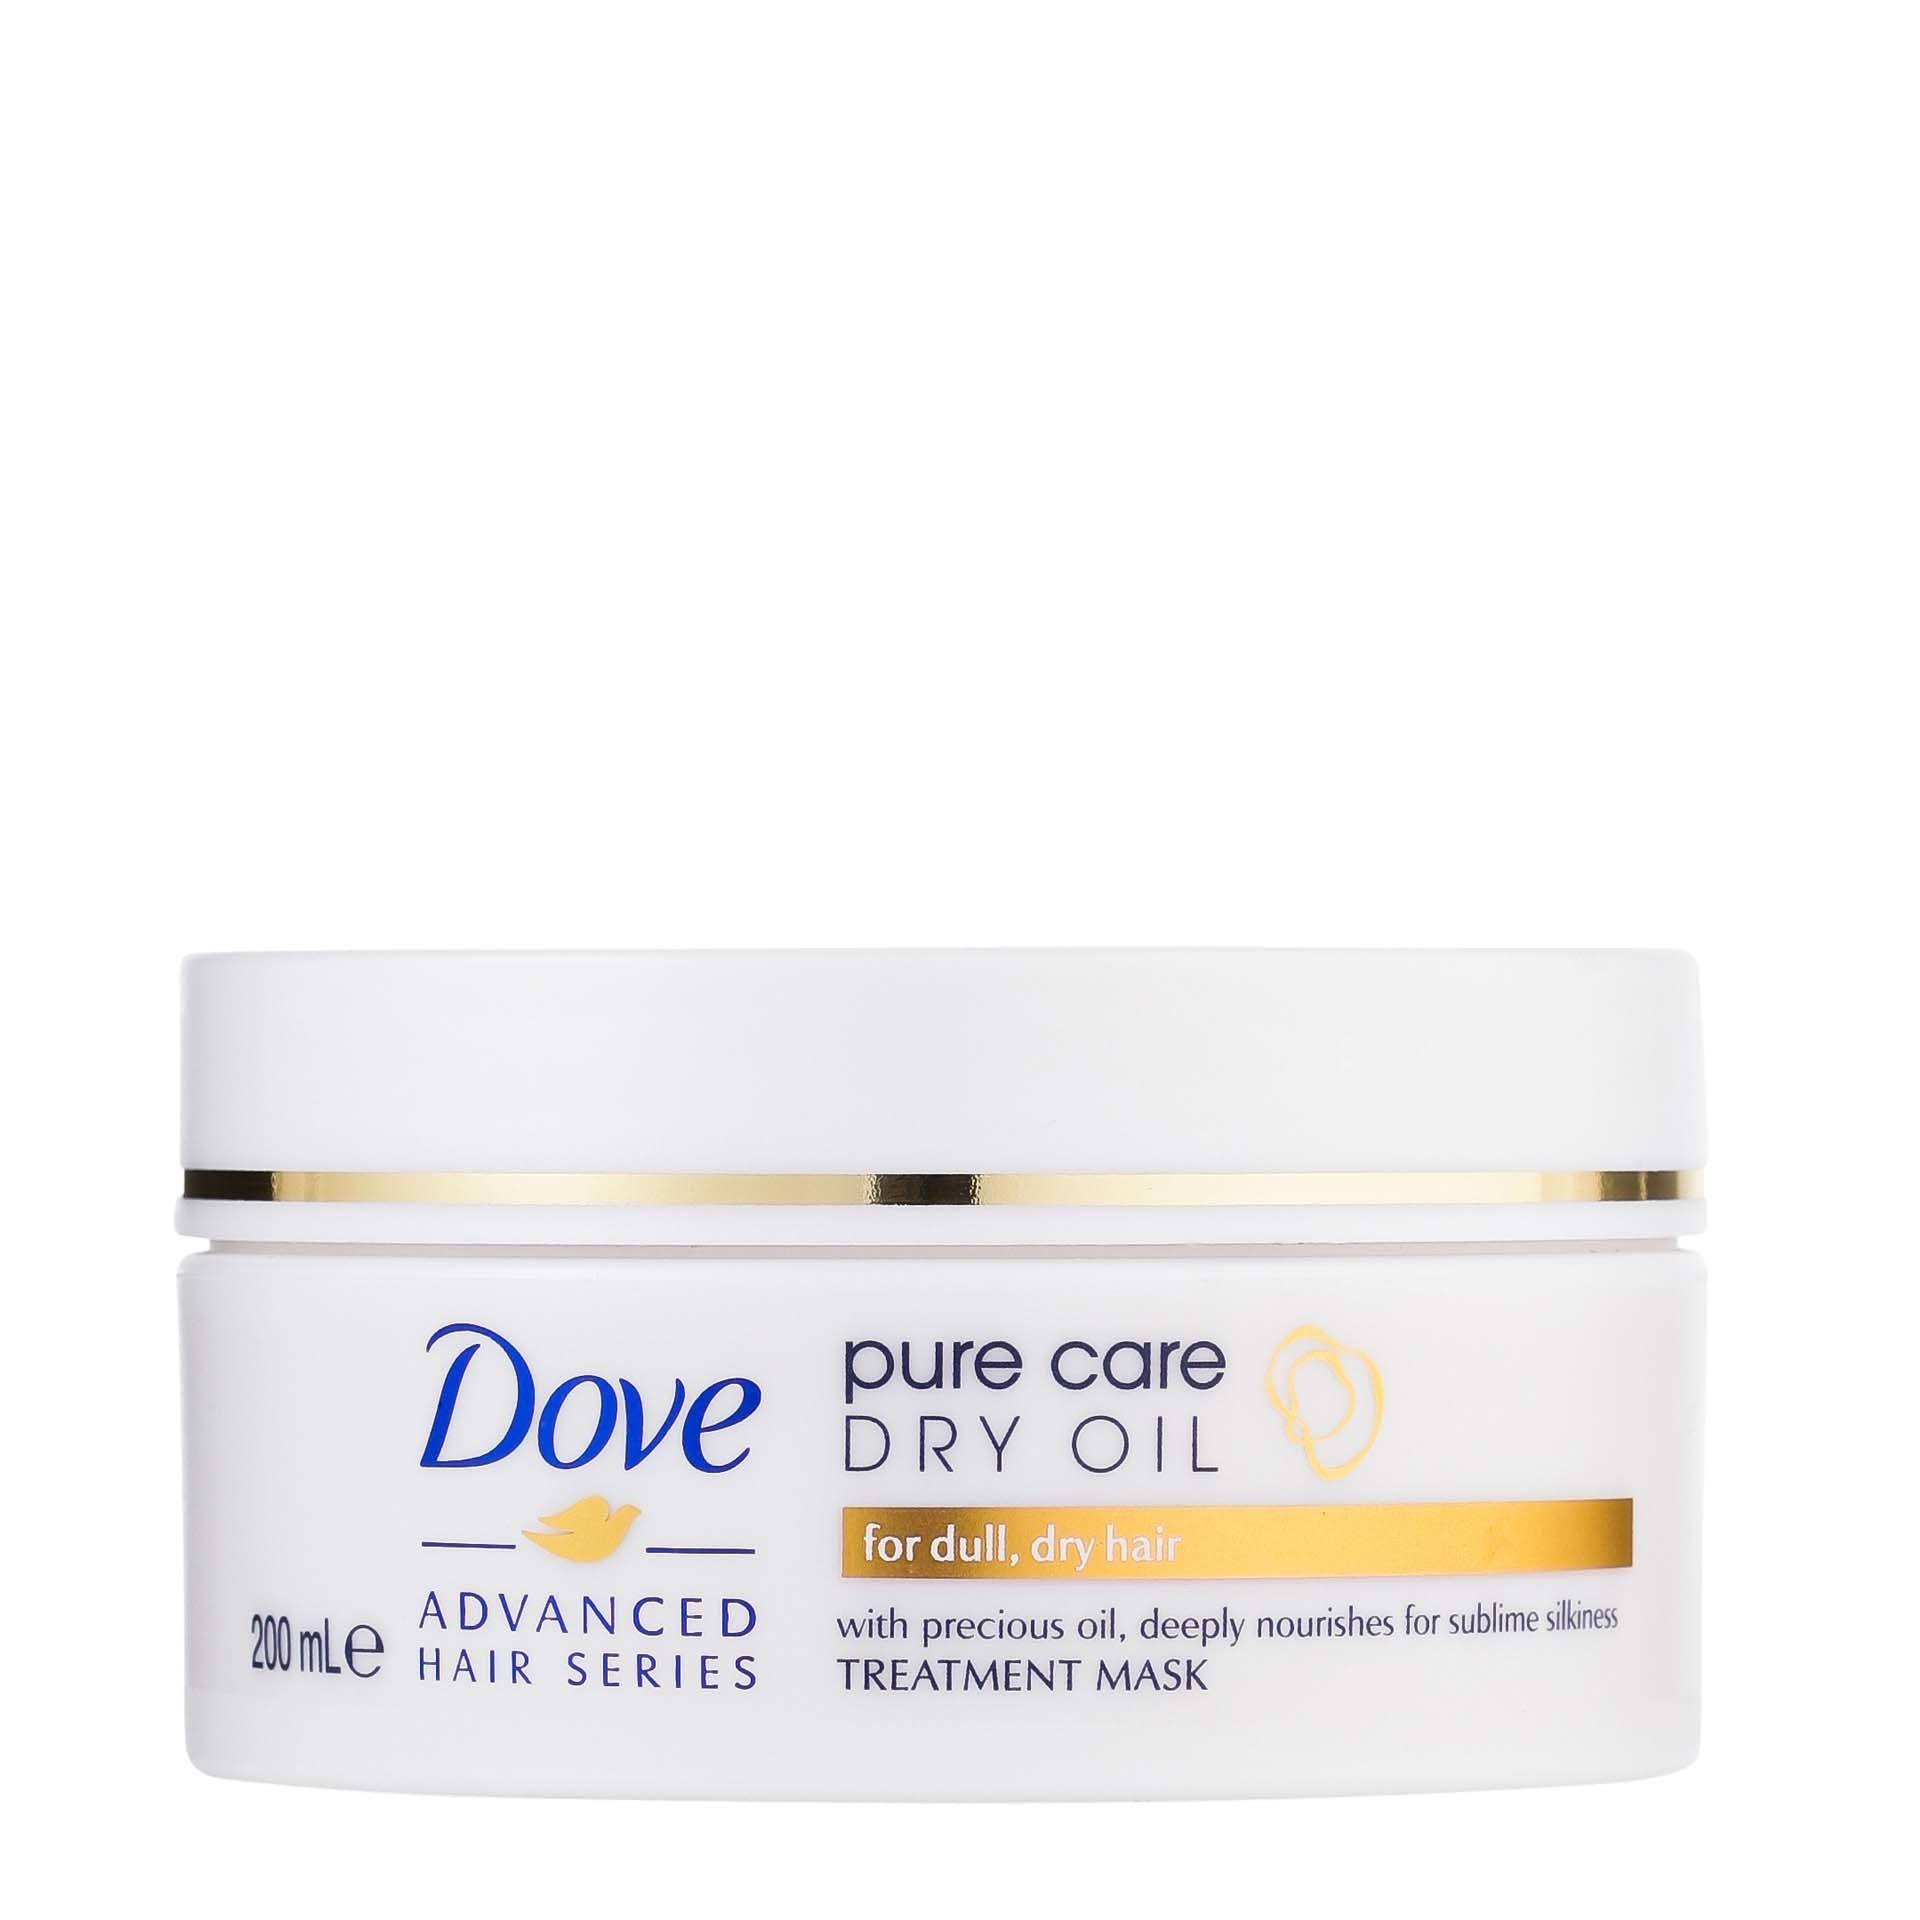 Dove Care Dry Oil hair mask for dry hair